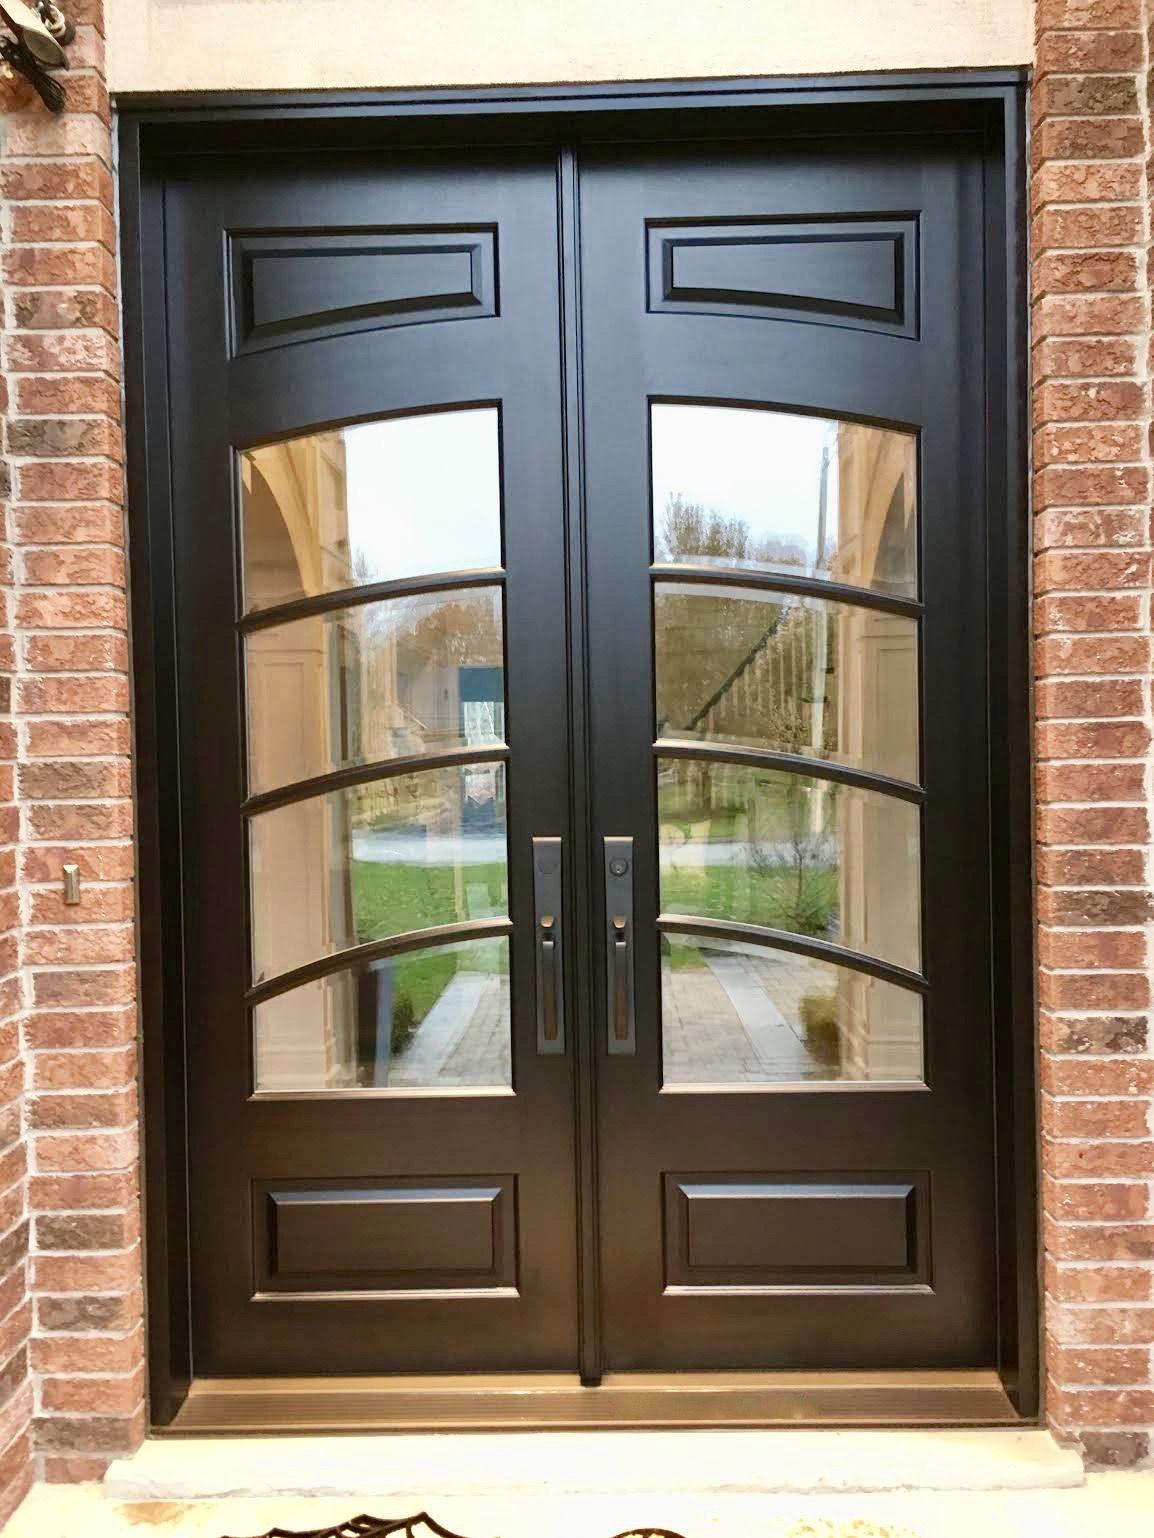 Amberwood Doors Inc: *Magnificent* #handmade #custommade #solid #mahogany